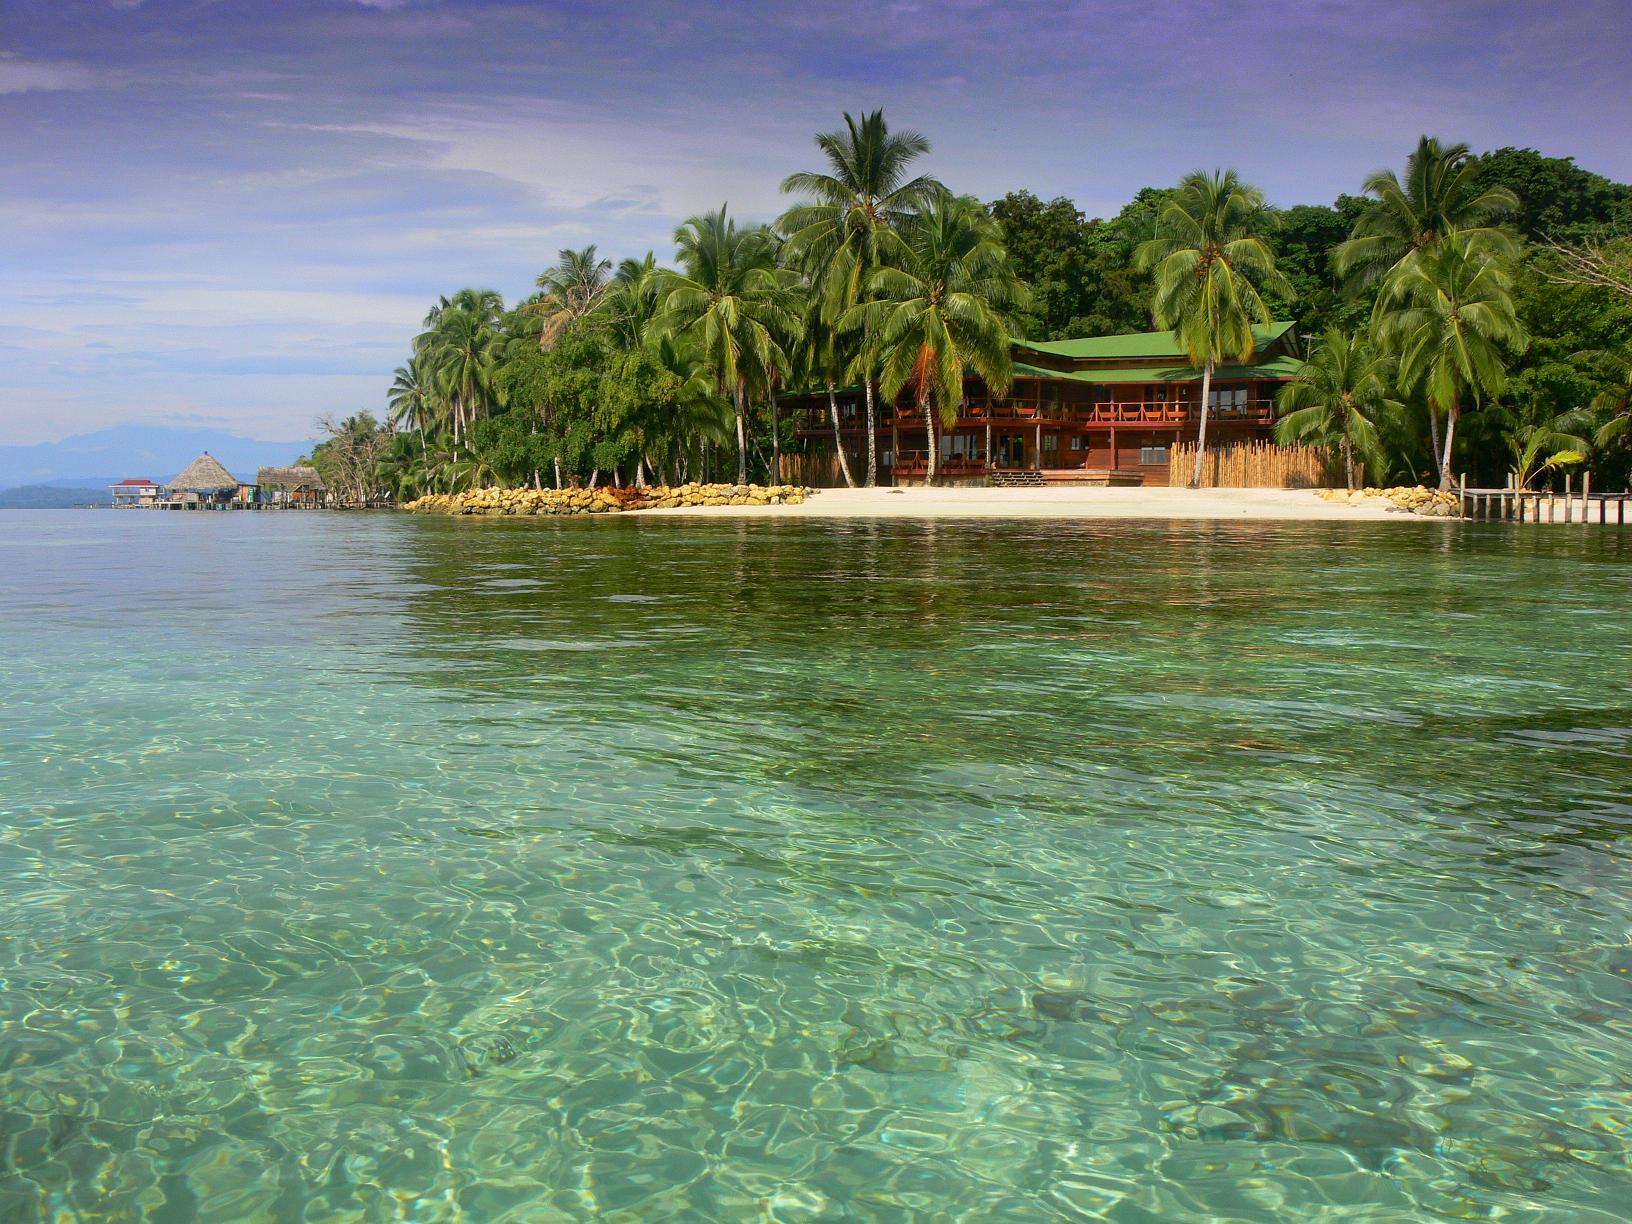 Isla-Carenero-bocas-del-toro-Panamá